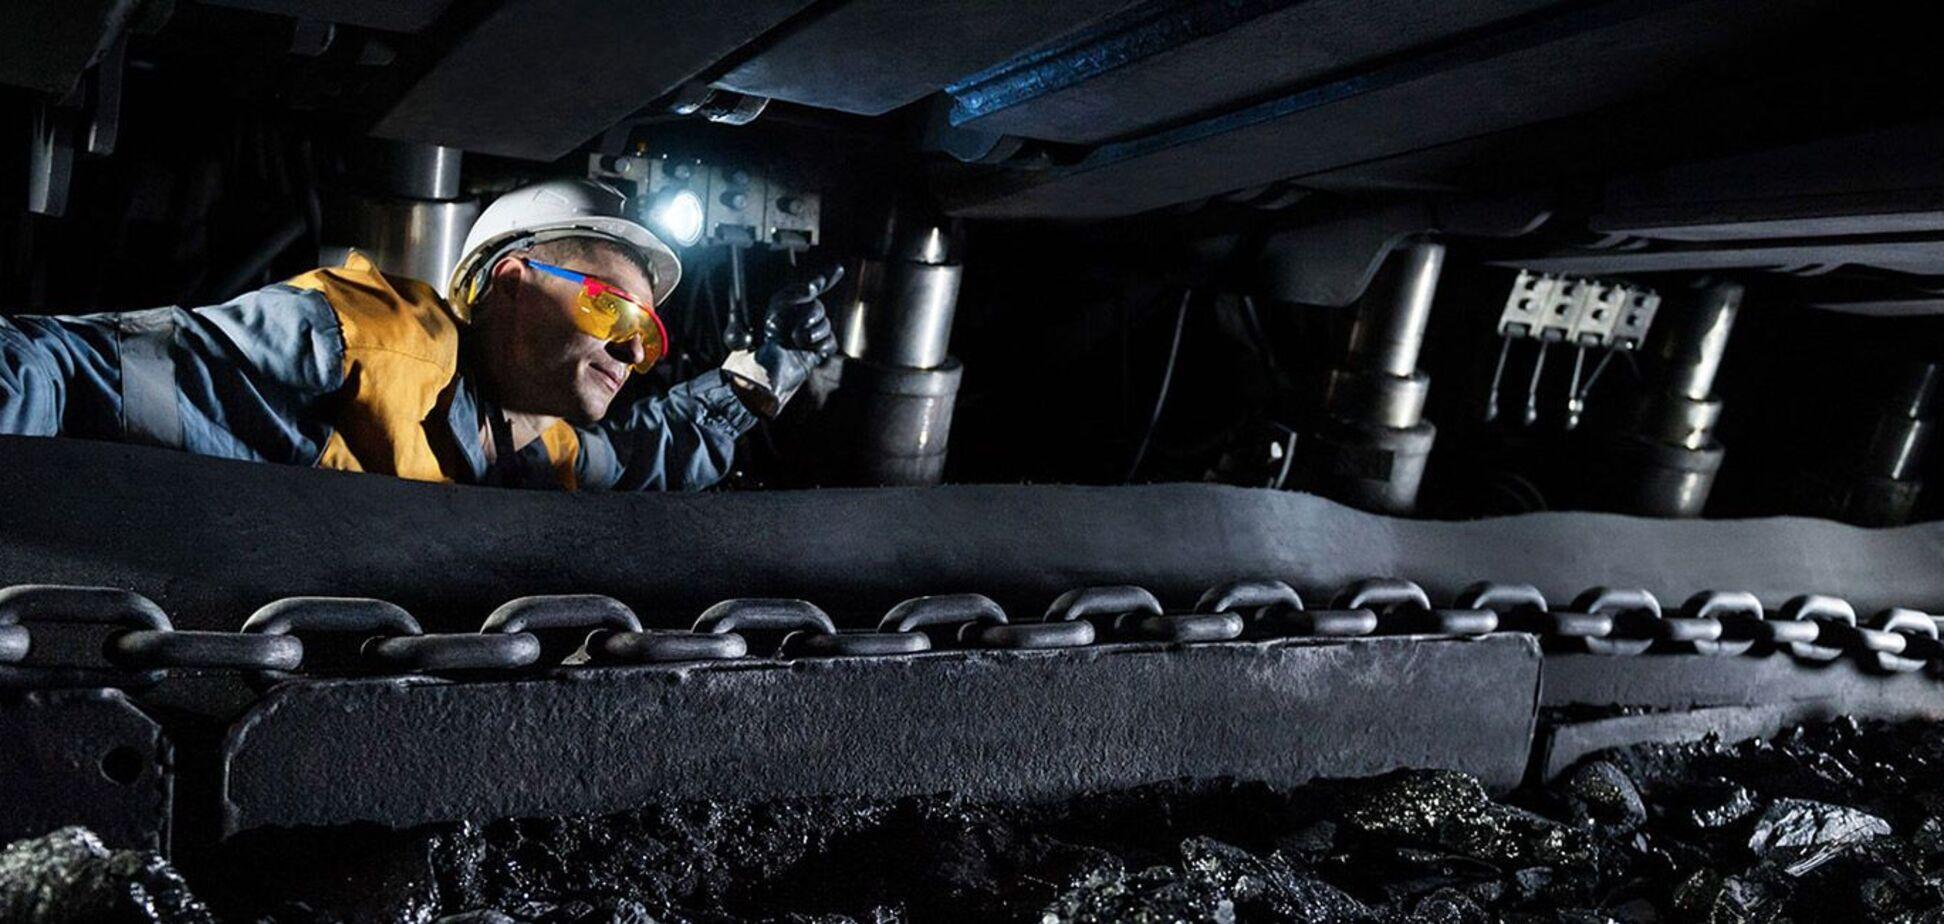 До конца года ДТЭК инвестирует в ремонты ТЭС 2,5 млрд грн благодаря нормализации ситуации на энергорынке